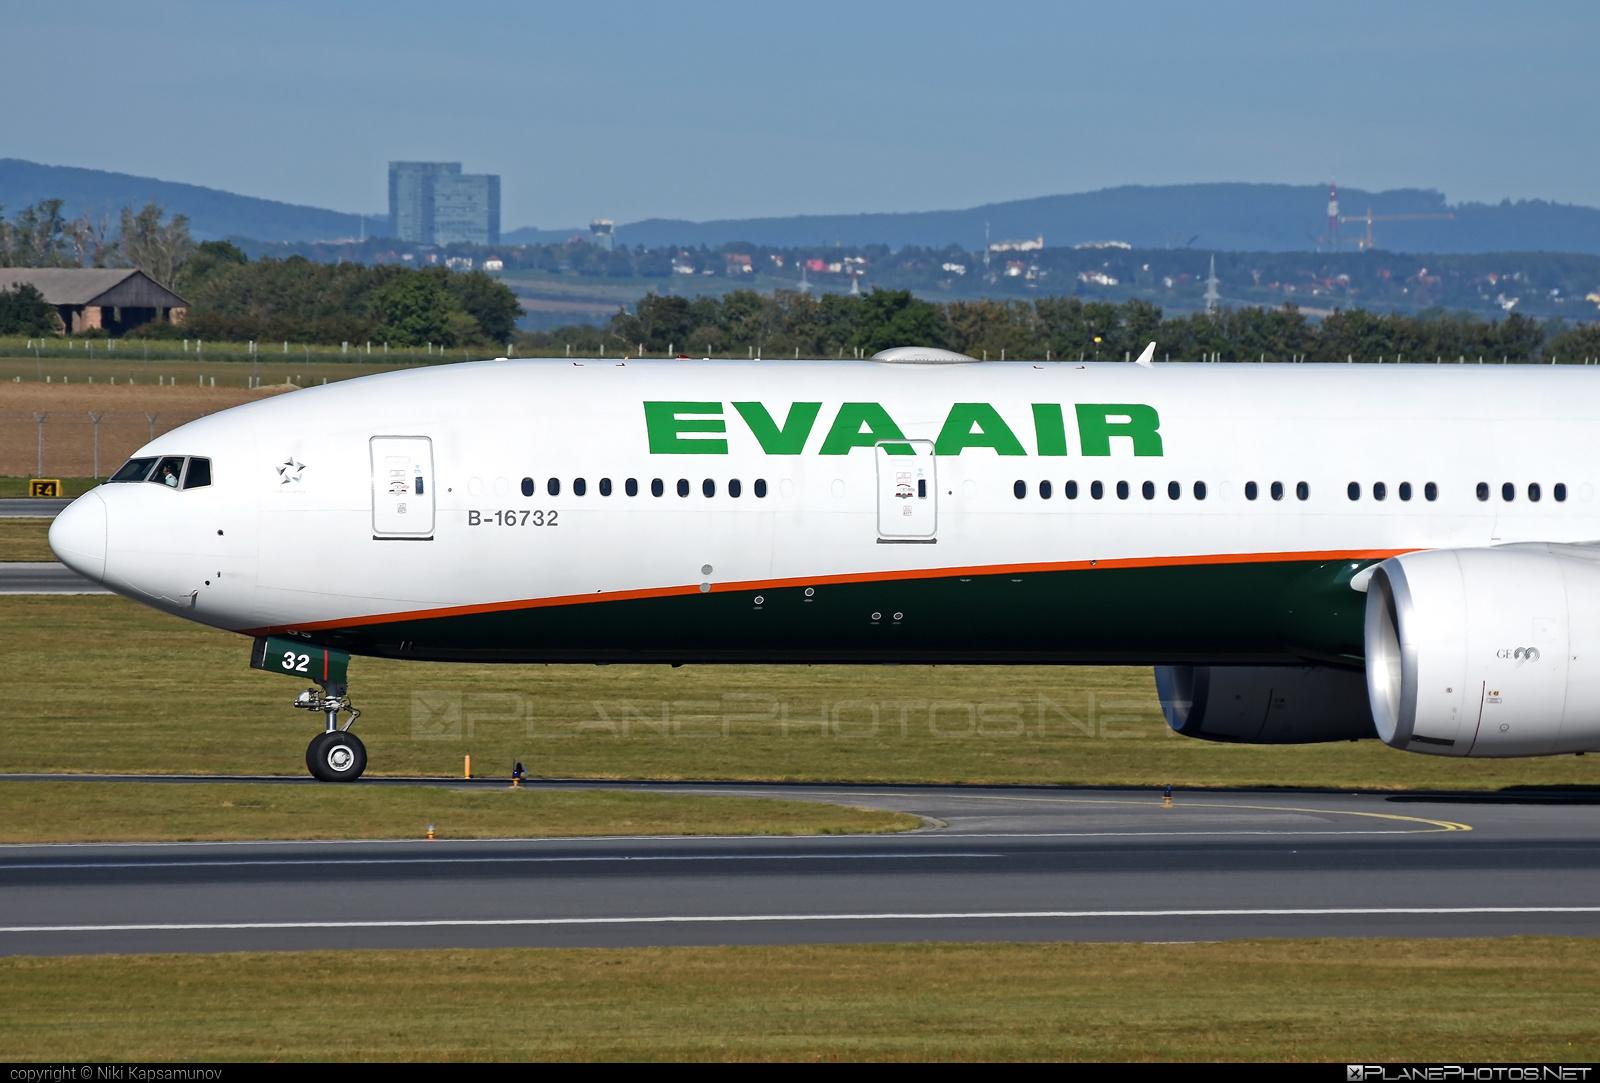 Boeing 777-300ER - B-16732 operated by EVA Air #b777 #b777er #boeing #boeing777 #tripleseven